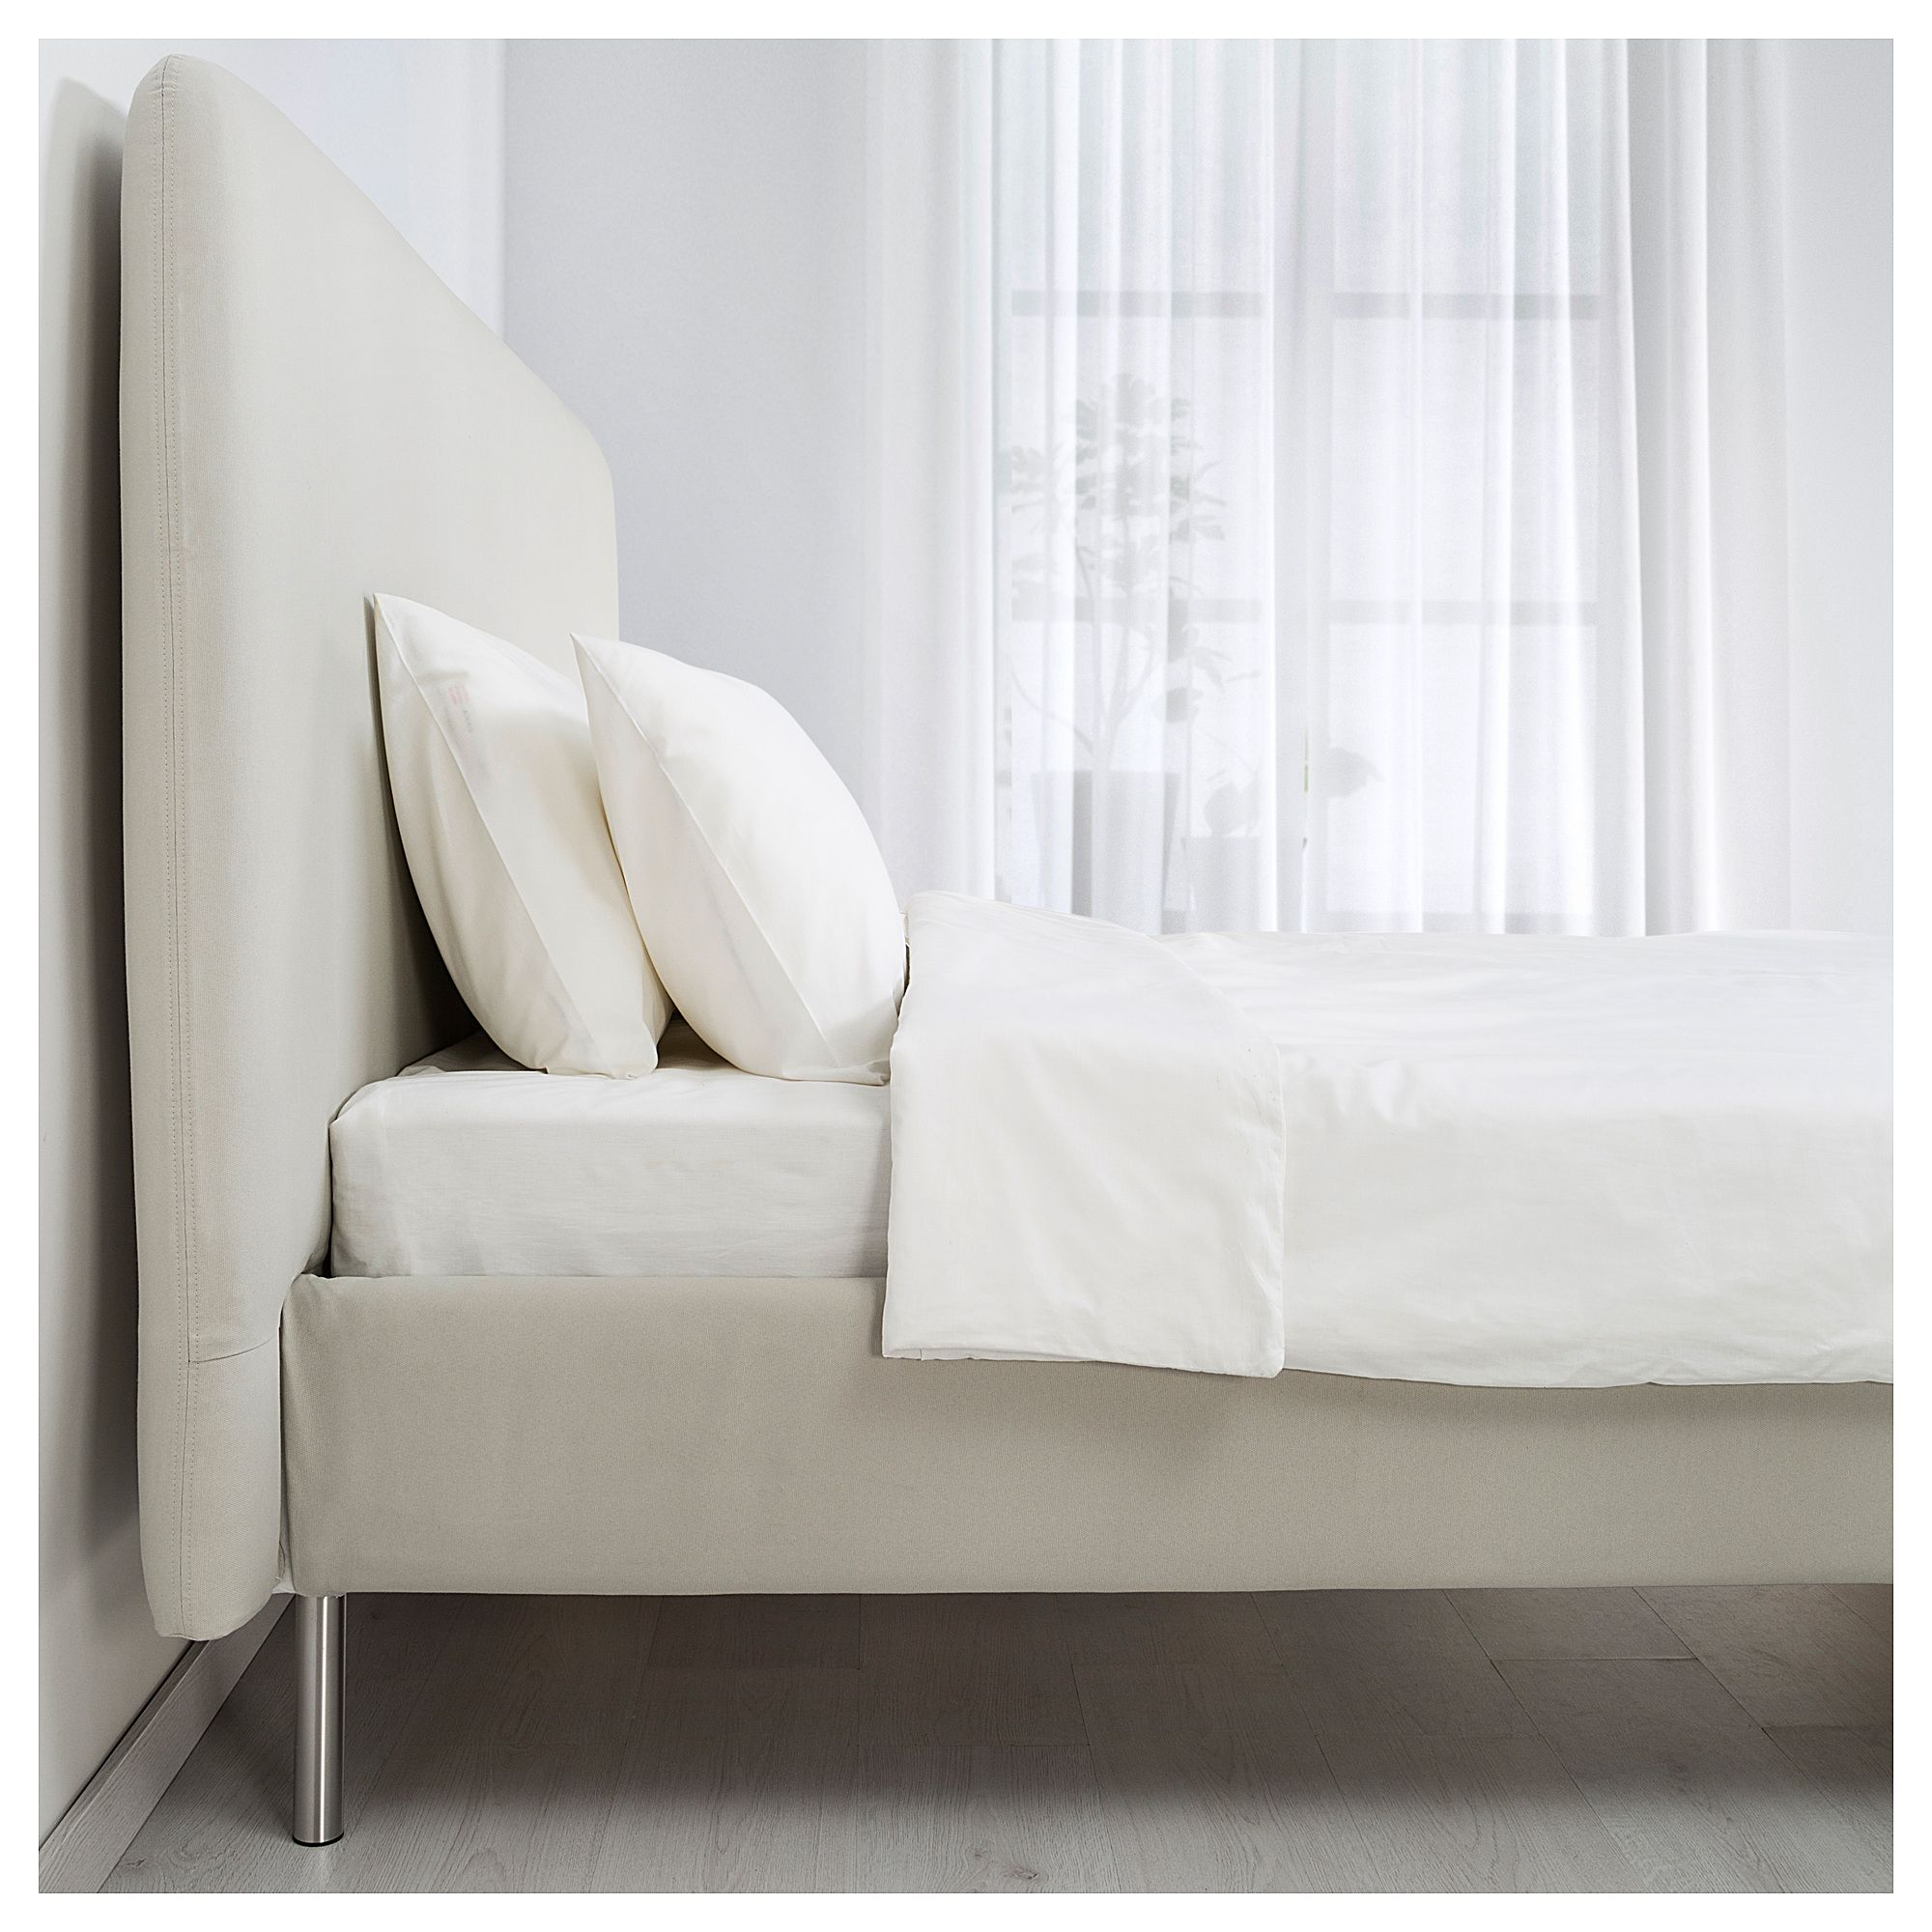 Ikea  Tomrefjord Bed Frame Beige, Leirsund